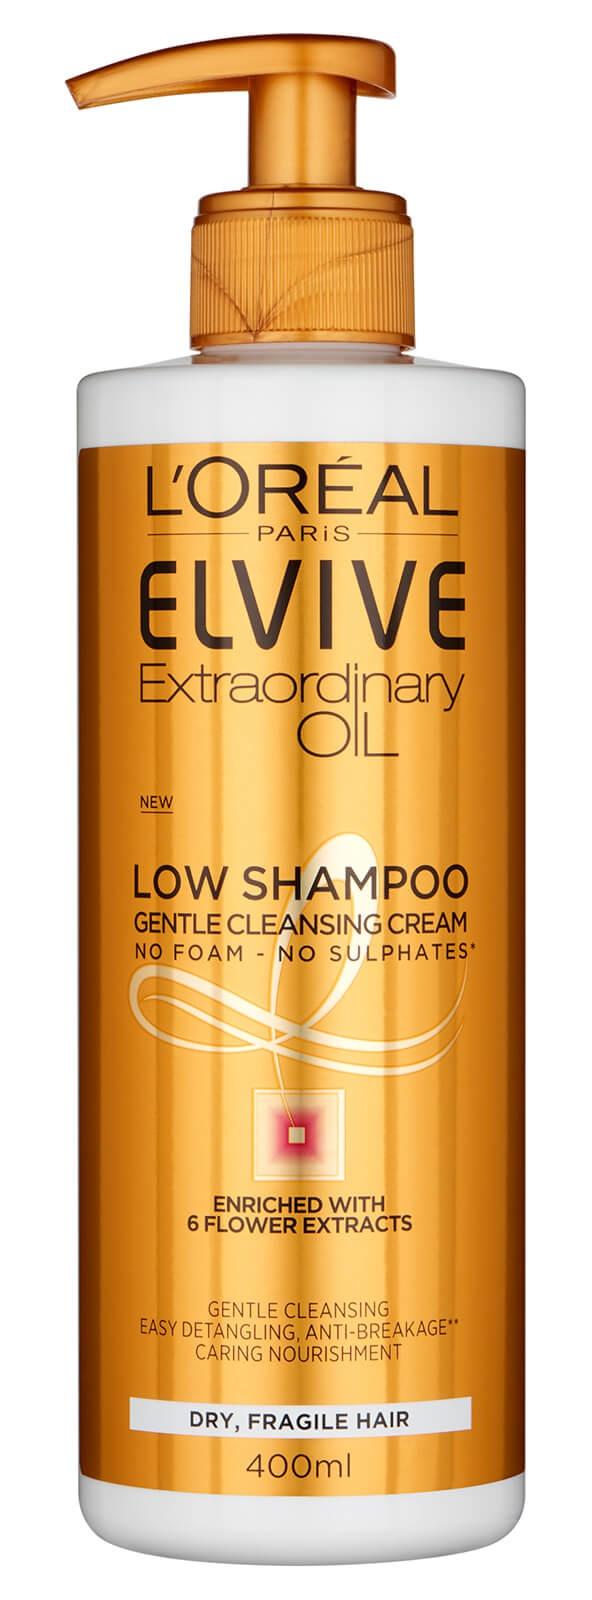 L'Oreal Paris Elvive Extraordinary Oil Low Shampoo